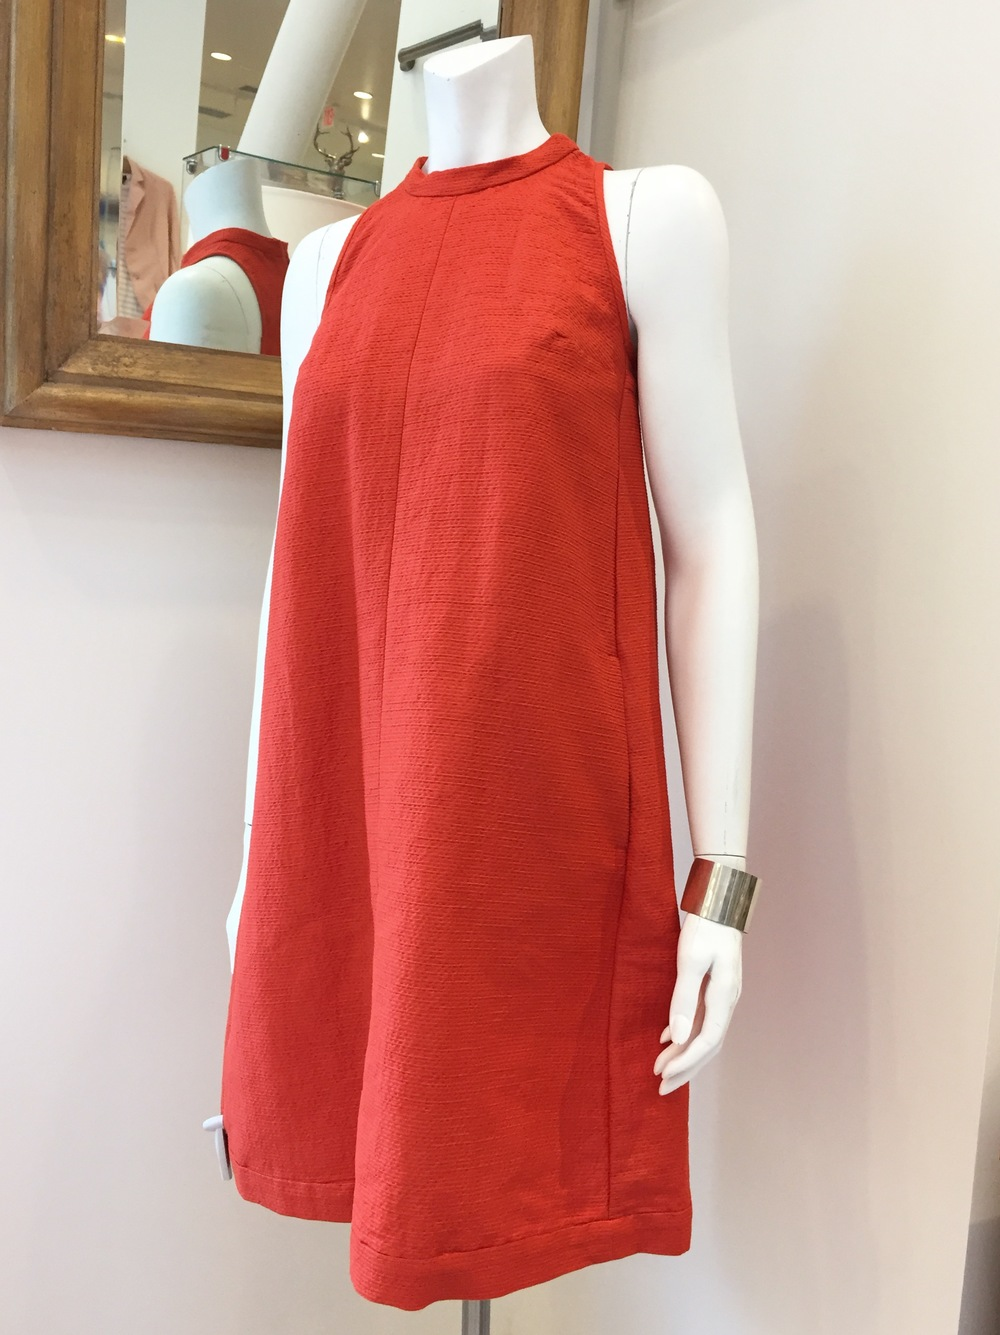 'SMax Mara Silk trapeze dress and Loren Stewart Sterling Silver Cuff